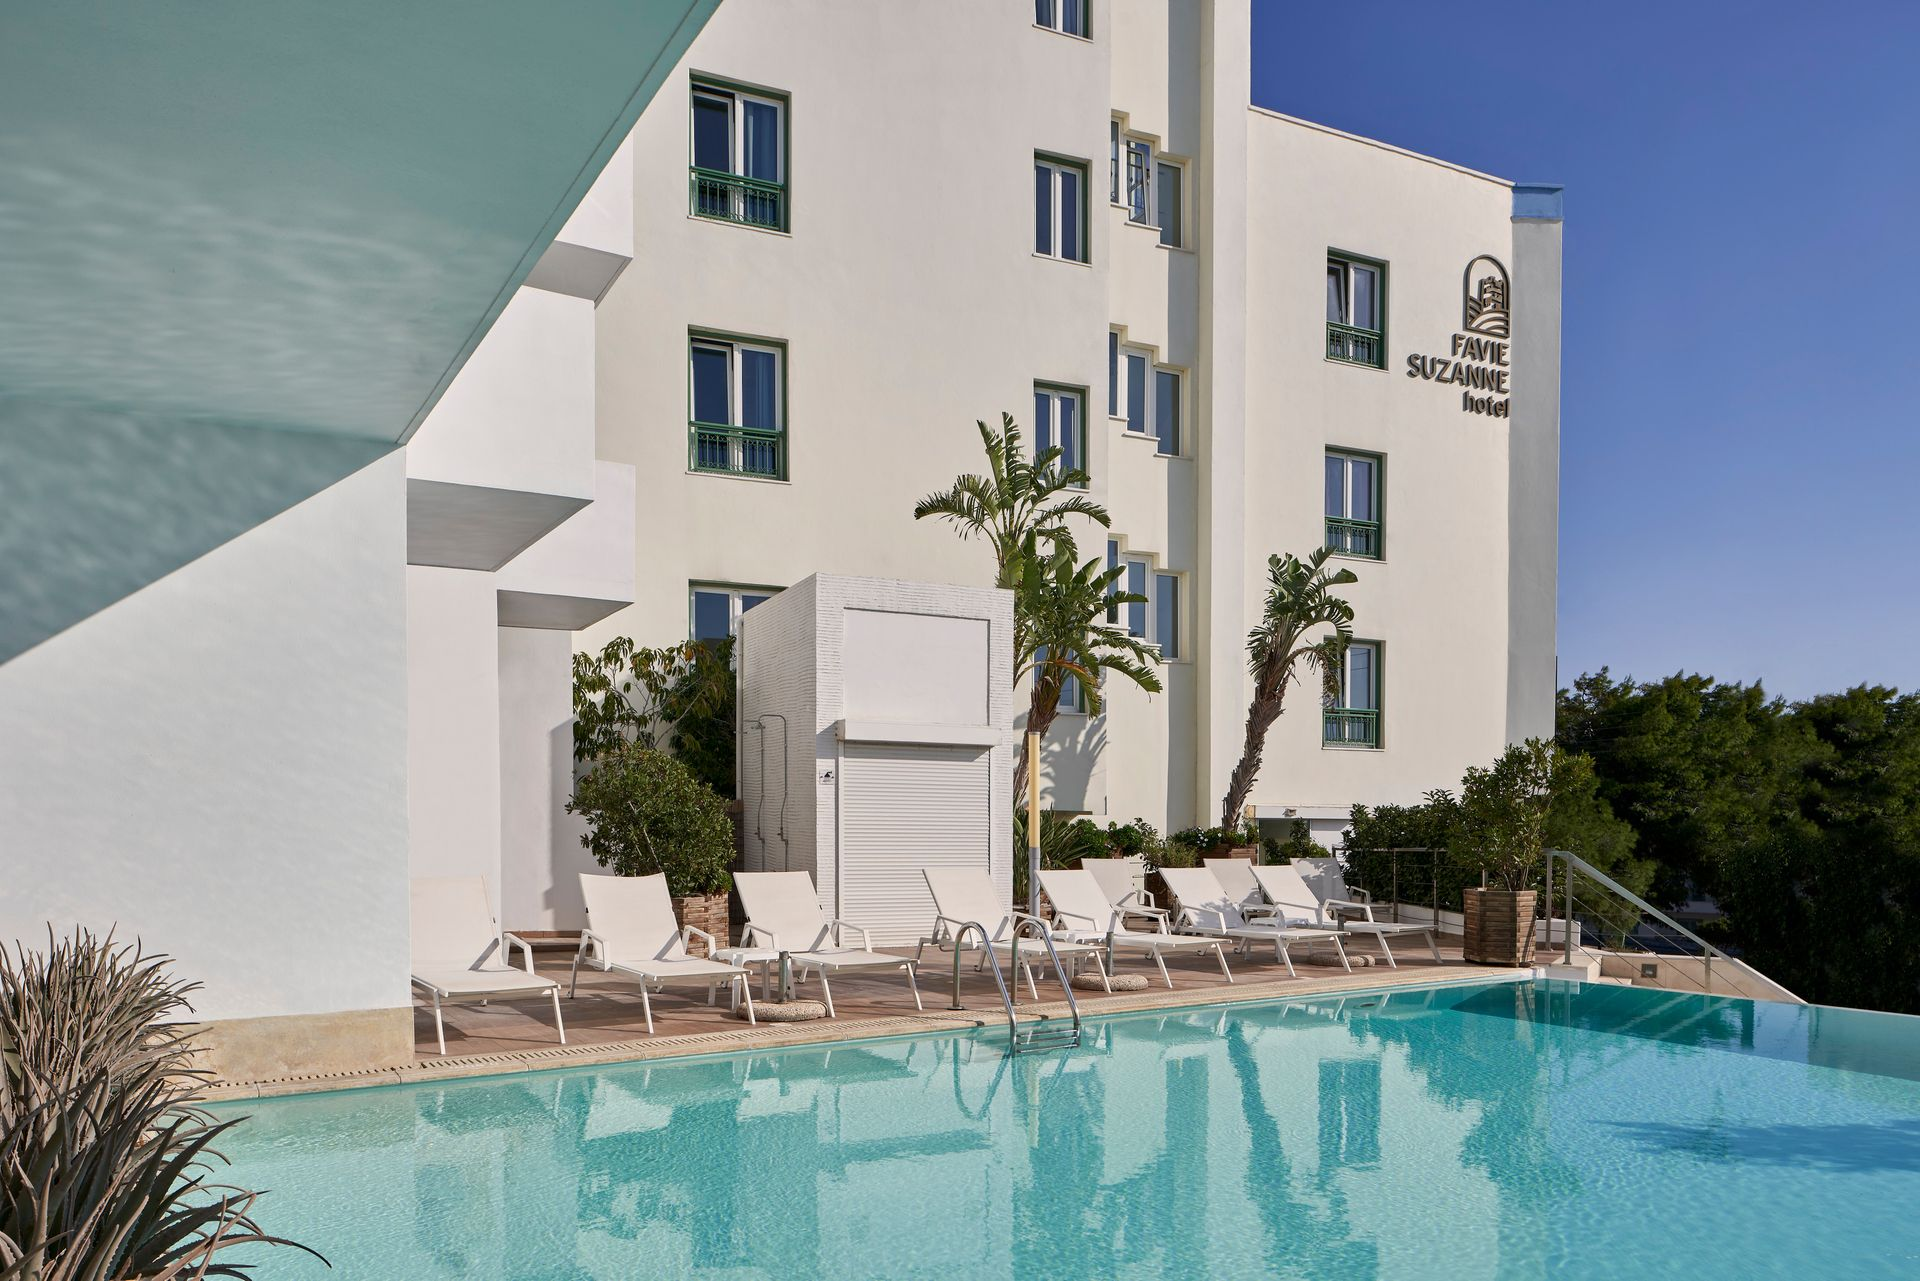 Favie Suzanne Hotel Tinos - Τήνος ✦ -43% ✦ 3 Ημέρες